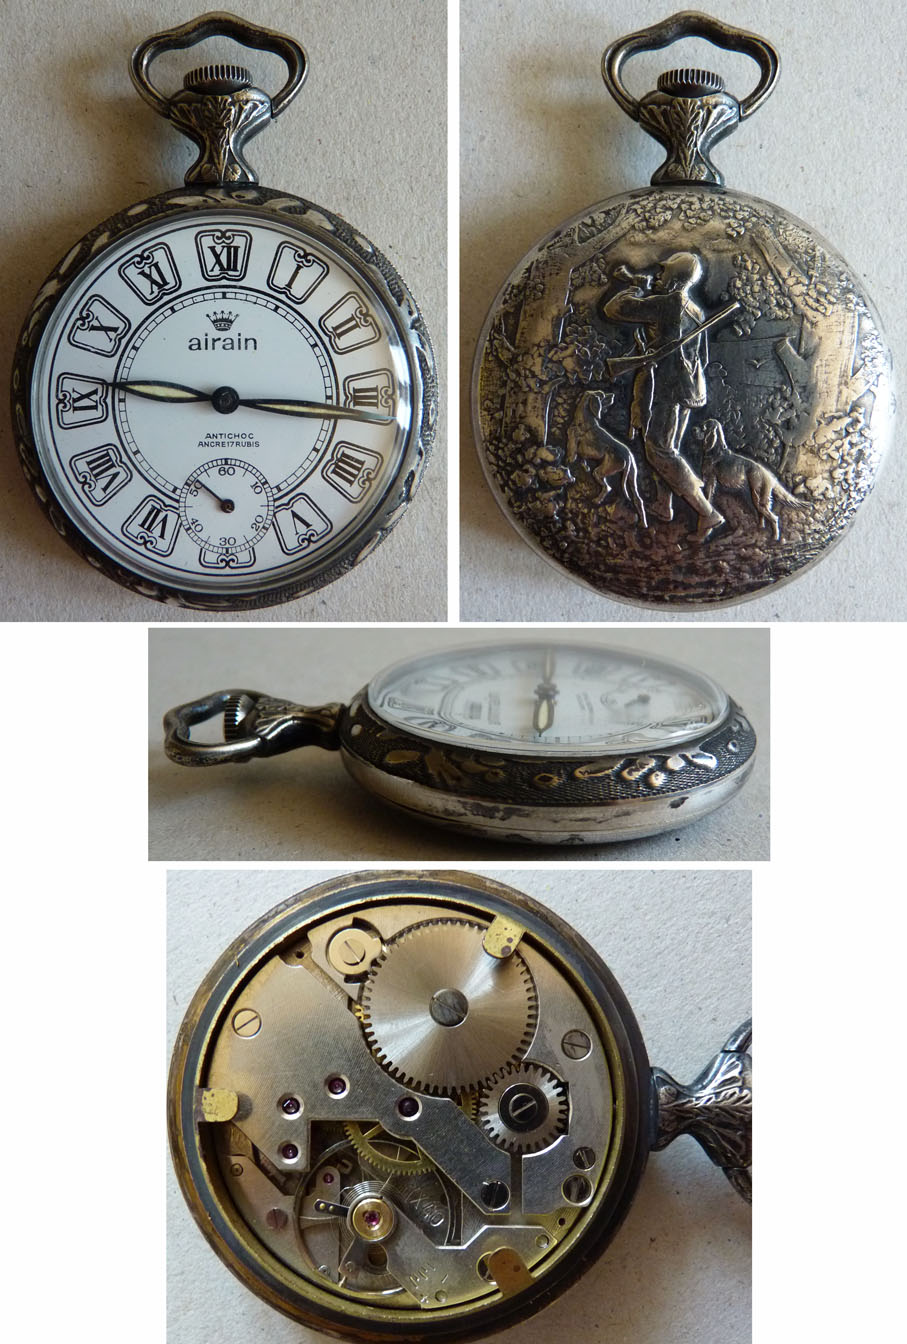 Montre gousset airain metal 20e si cle d cor chasse chasseur chien hunting watch ebay for Montre decoration